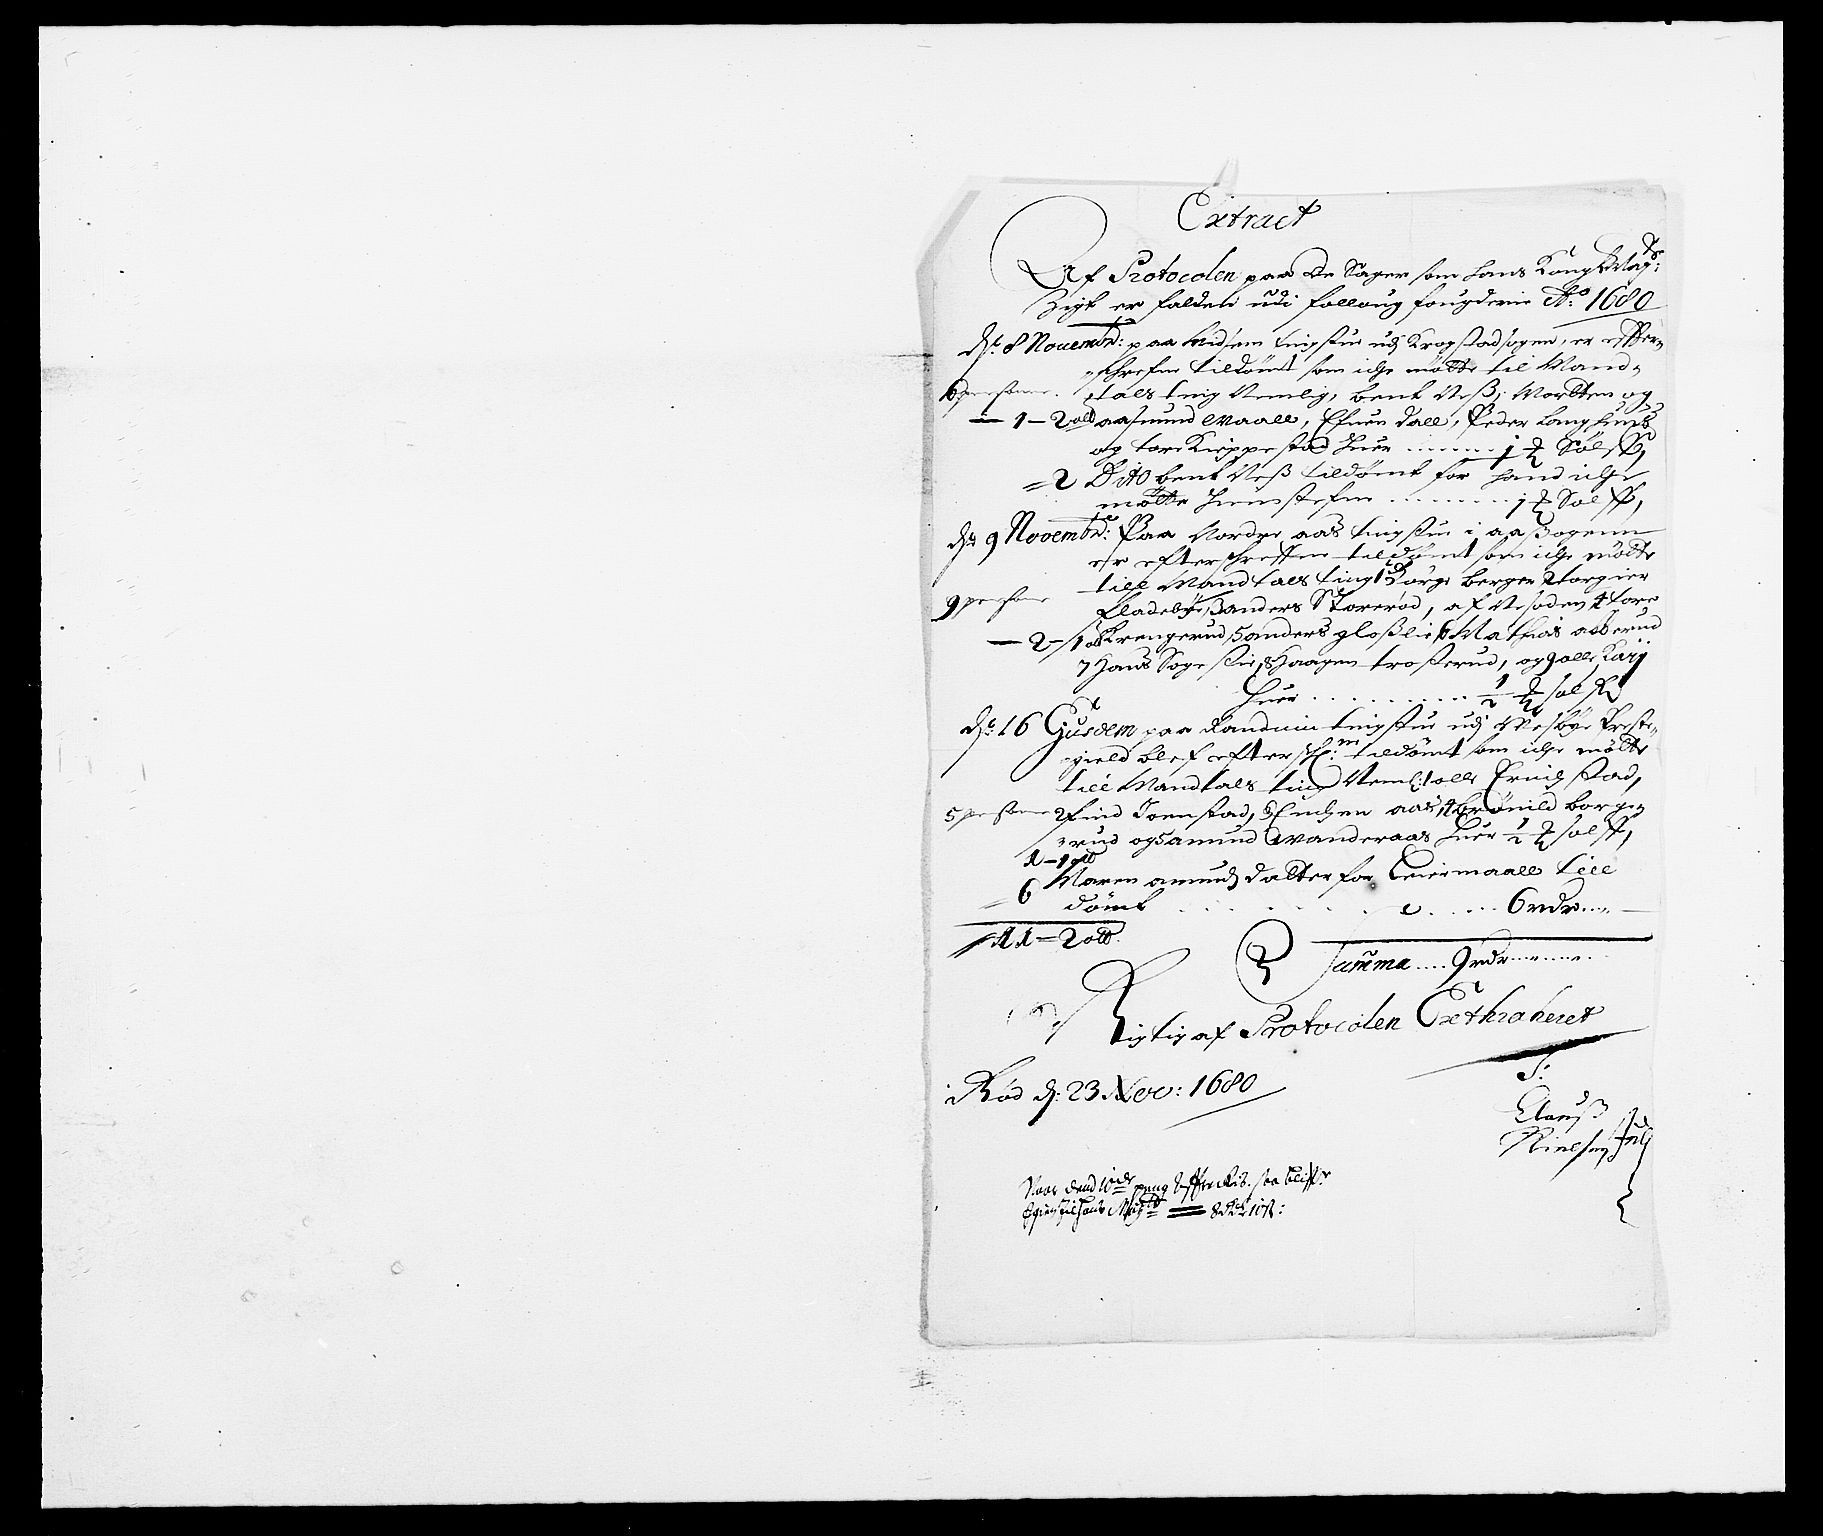 RA, Rentekammeret inntil 1814, Reviderte regnskaper, Fogderegnskap, R09/L0429: Fogderegnskap Follo, 1680-1681, s. 39